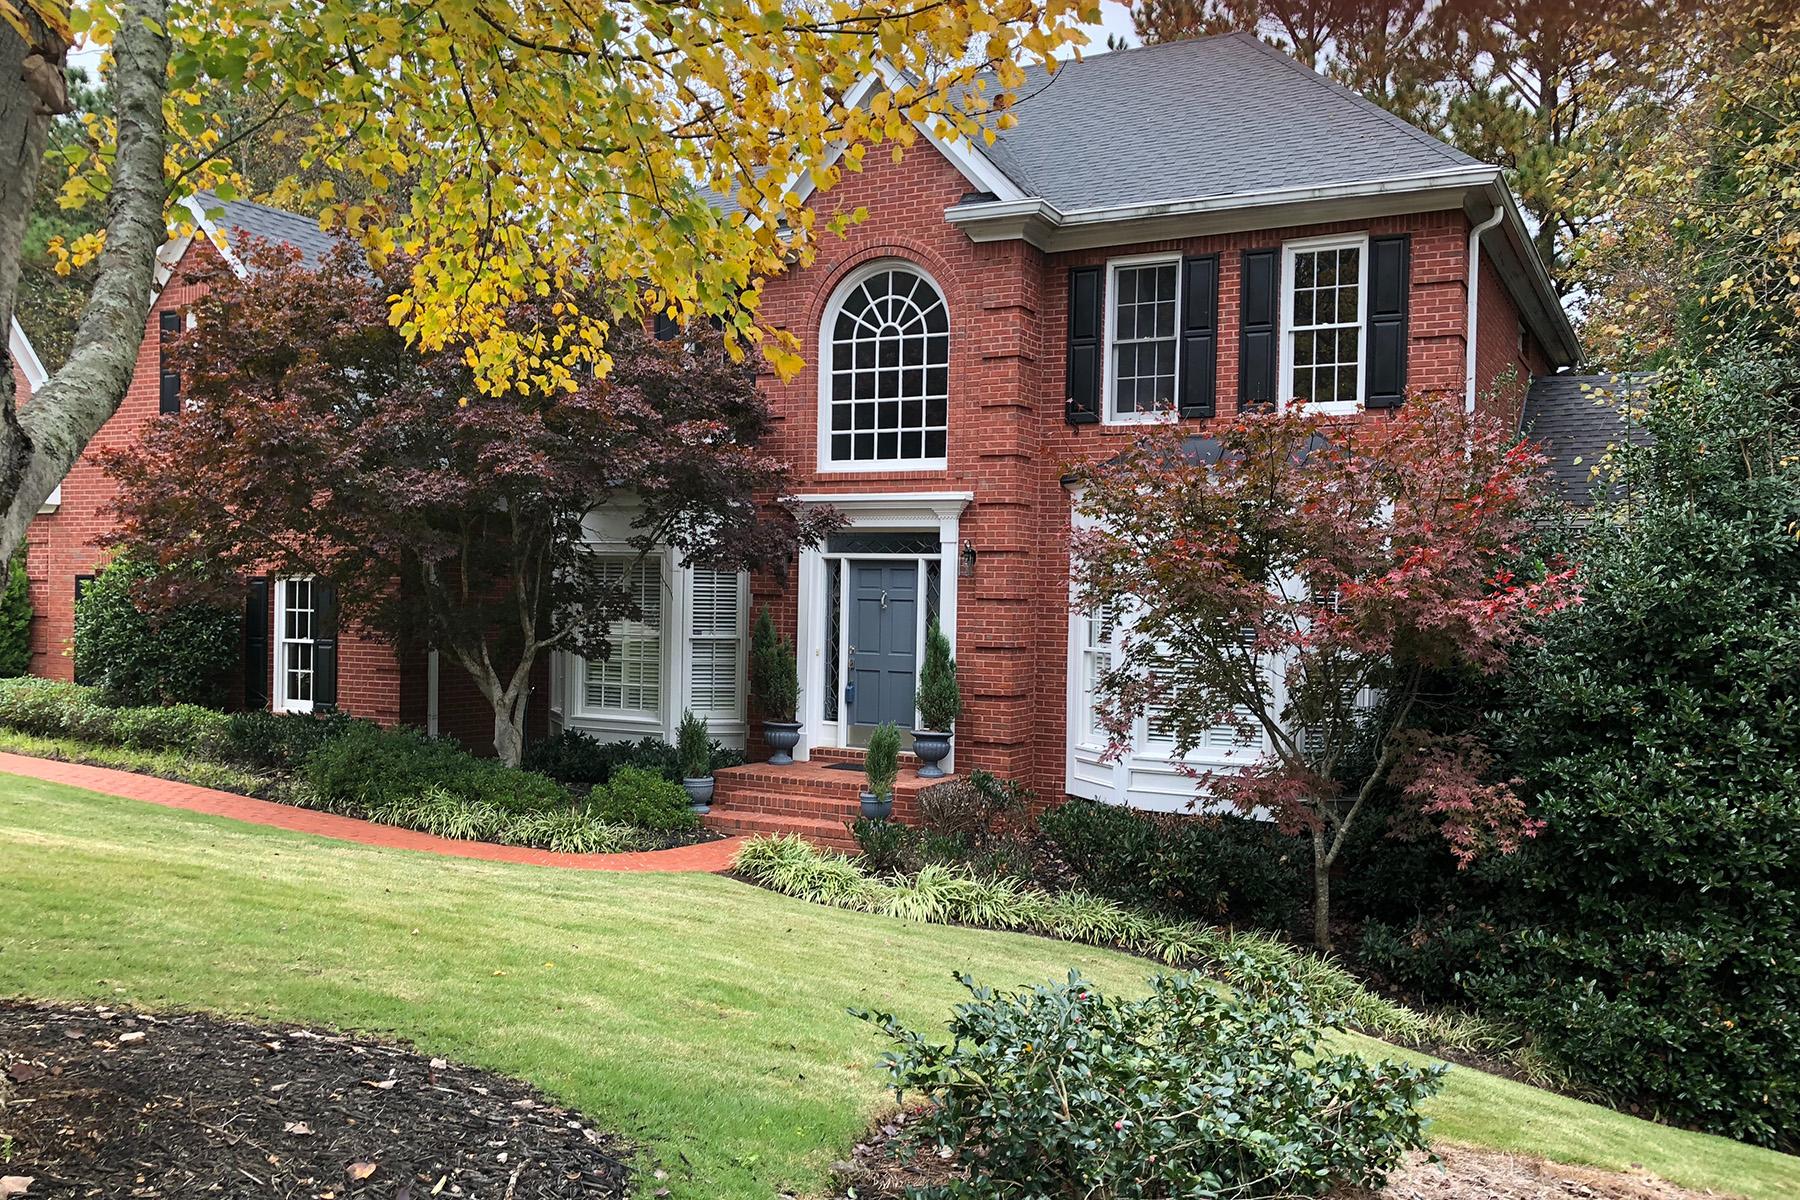 Single Family Home for Sale at East Cobb Brick Beauty 4846 Trevor Court Marietta, Georgia 30068 United States